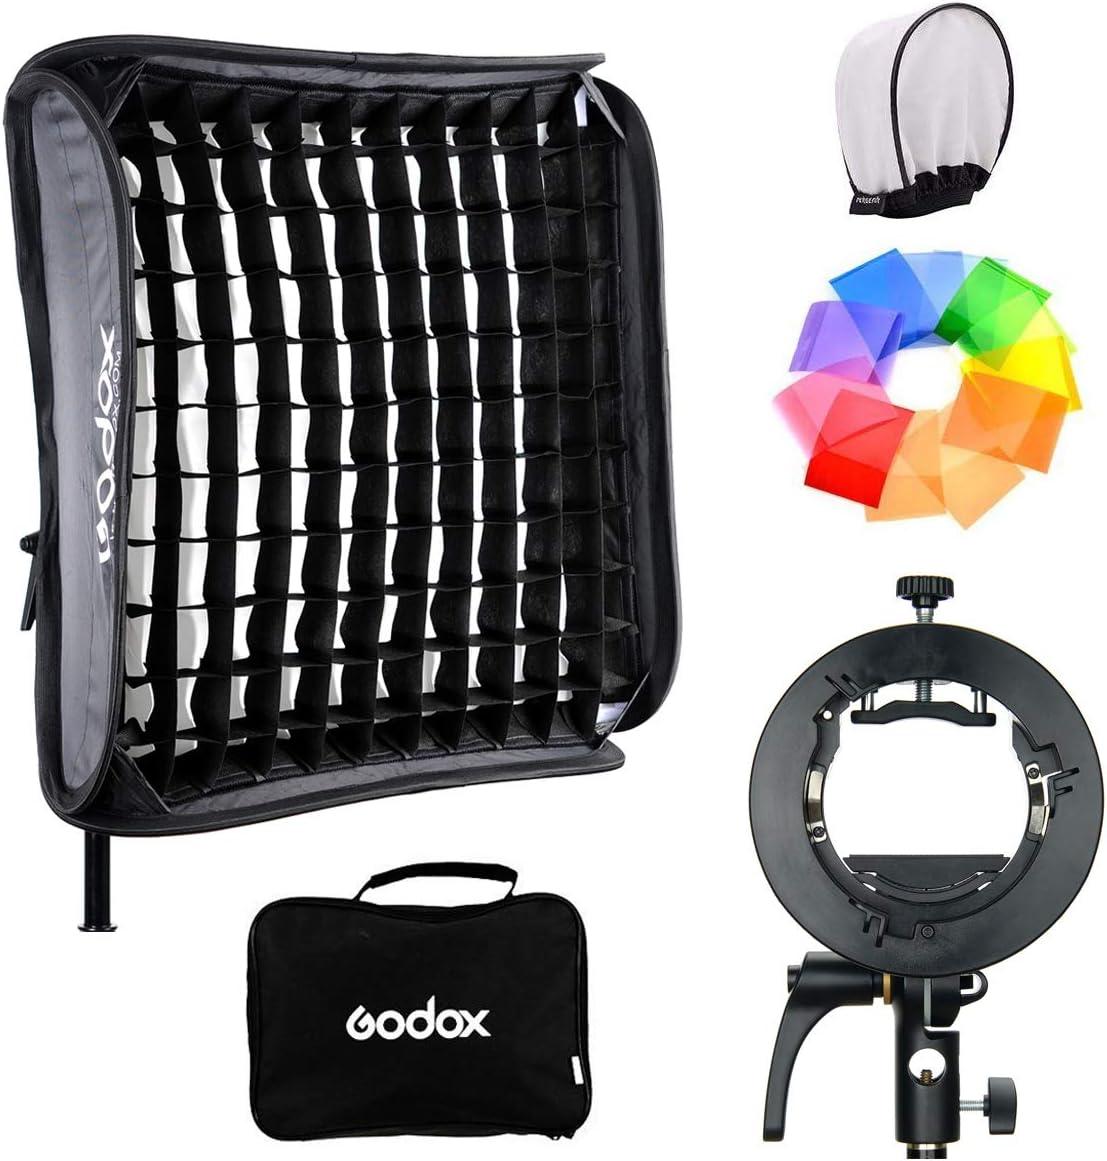 Godox S2 S Type Halterung Mit Softbox Honeycomb Grid Kamera